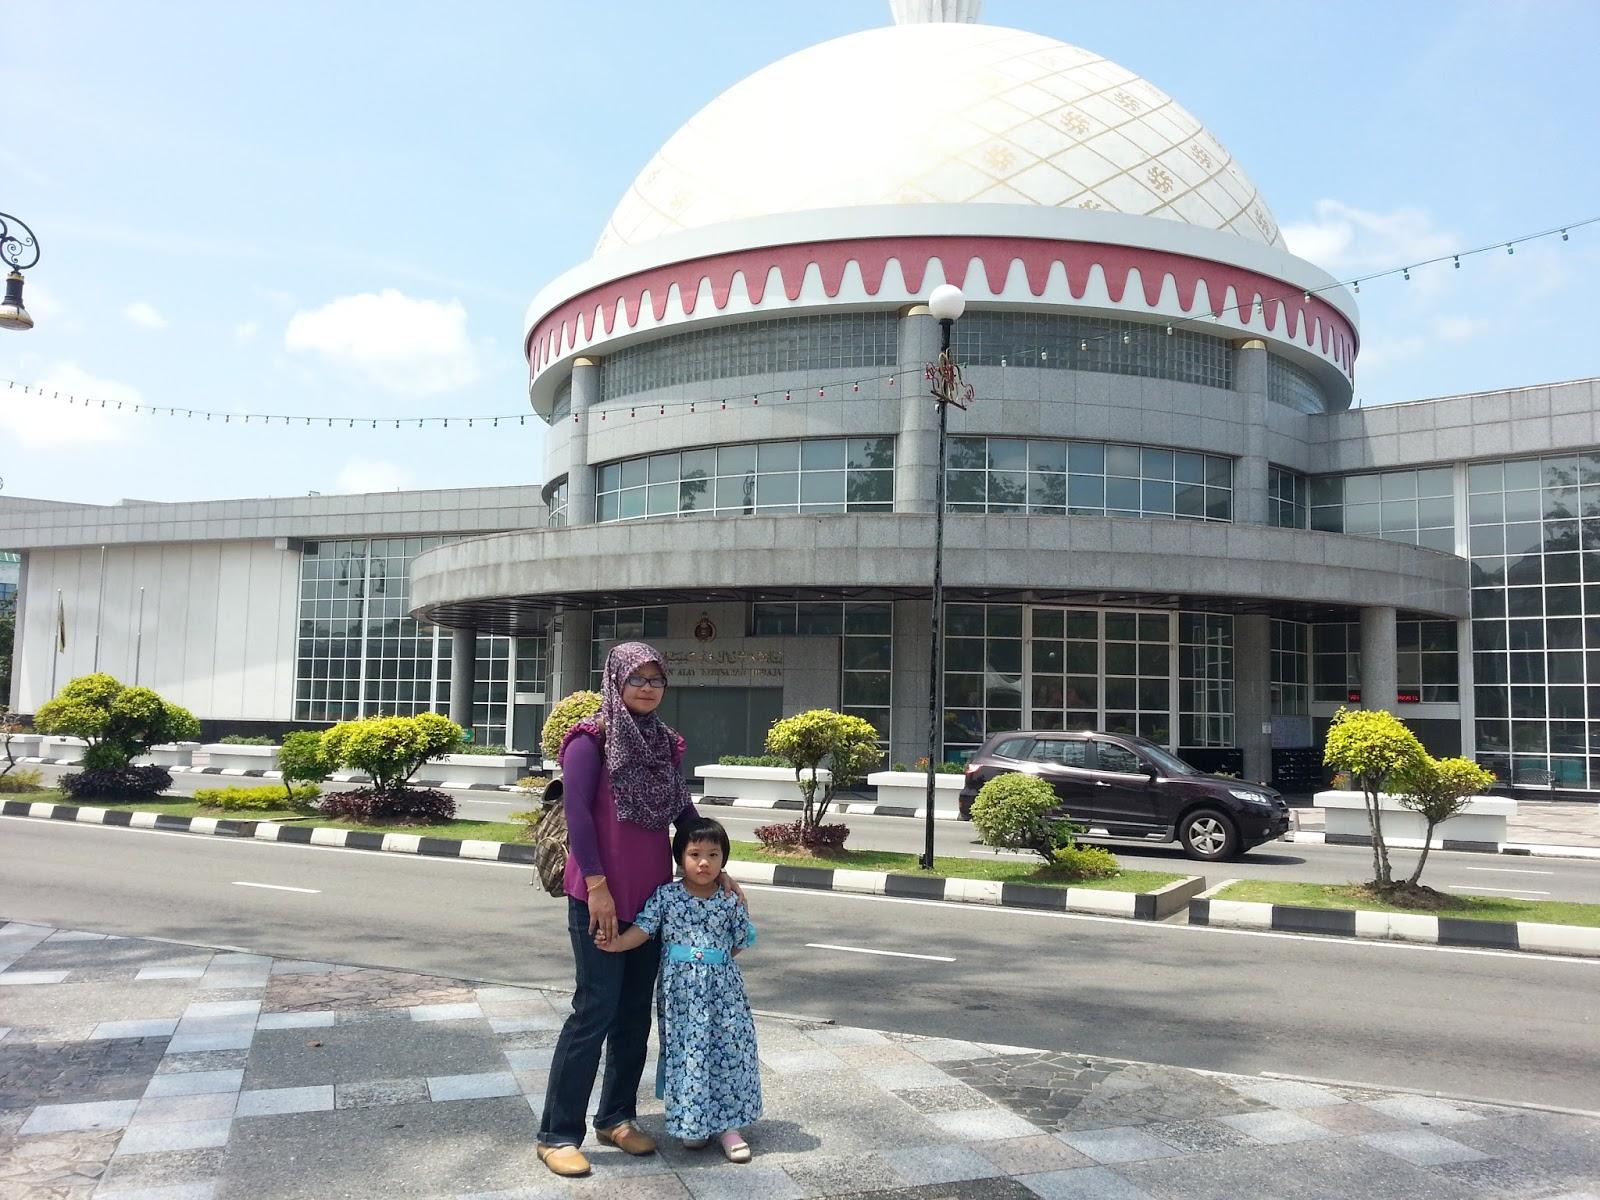 http://www.khairunnisahamdan.com/2015/03/trip-to-brunei-darussalam-galeri-diraja.html